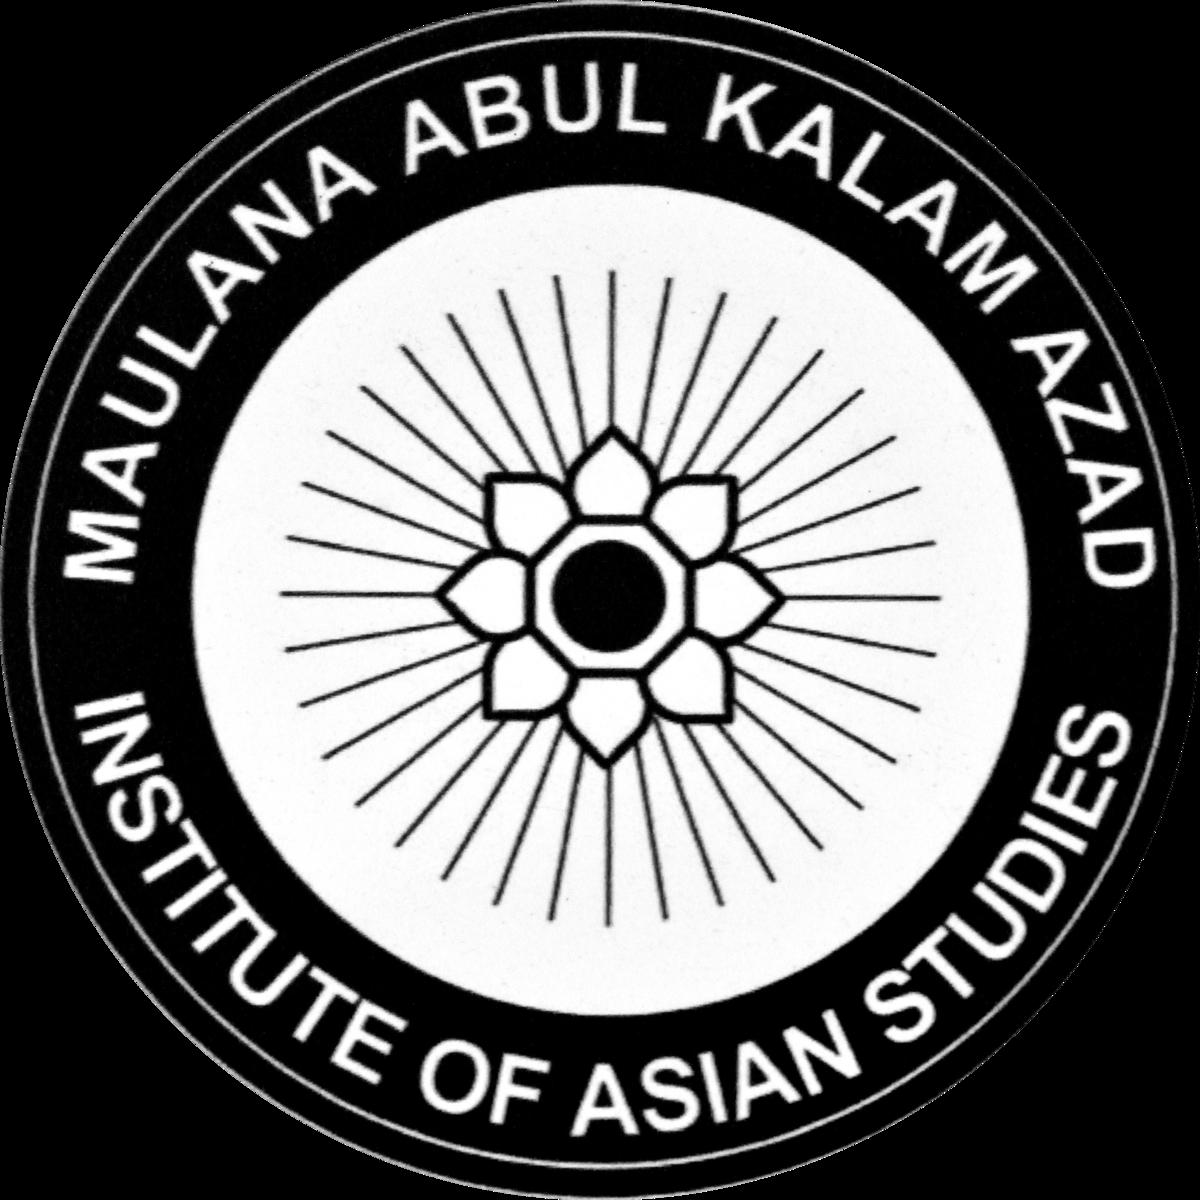 Maulana Abul Kalam Azad Institute Of Asian Studies Wikipedia